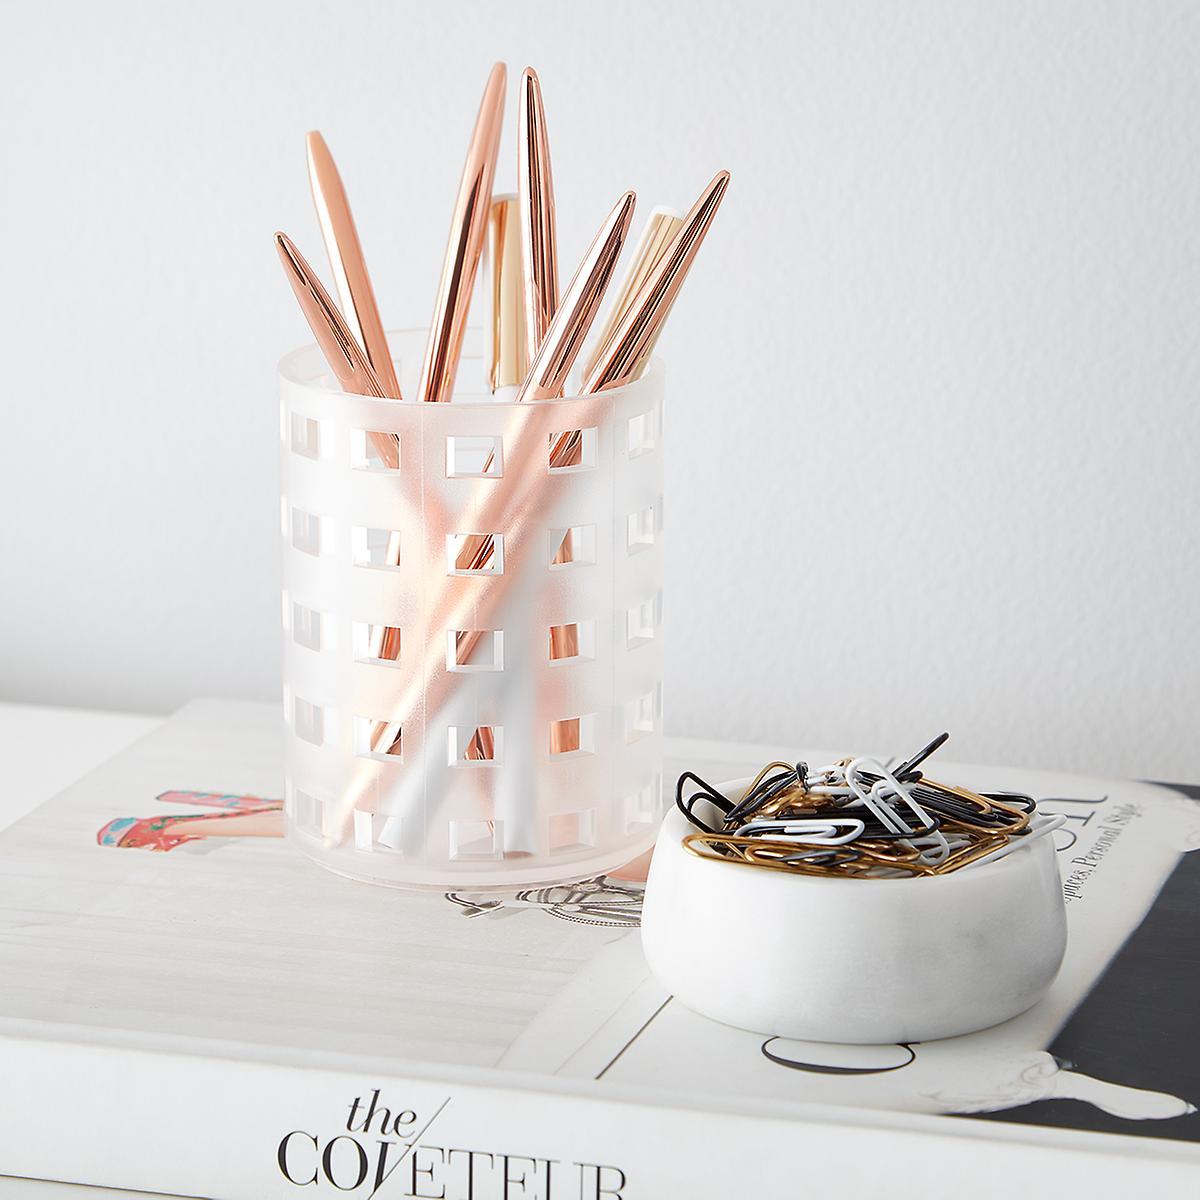 Like-it Bricks Round Pencil Cup